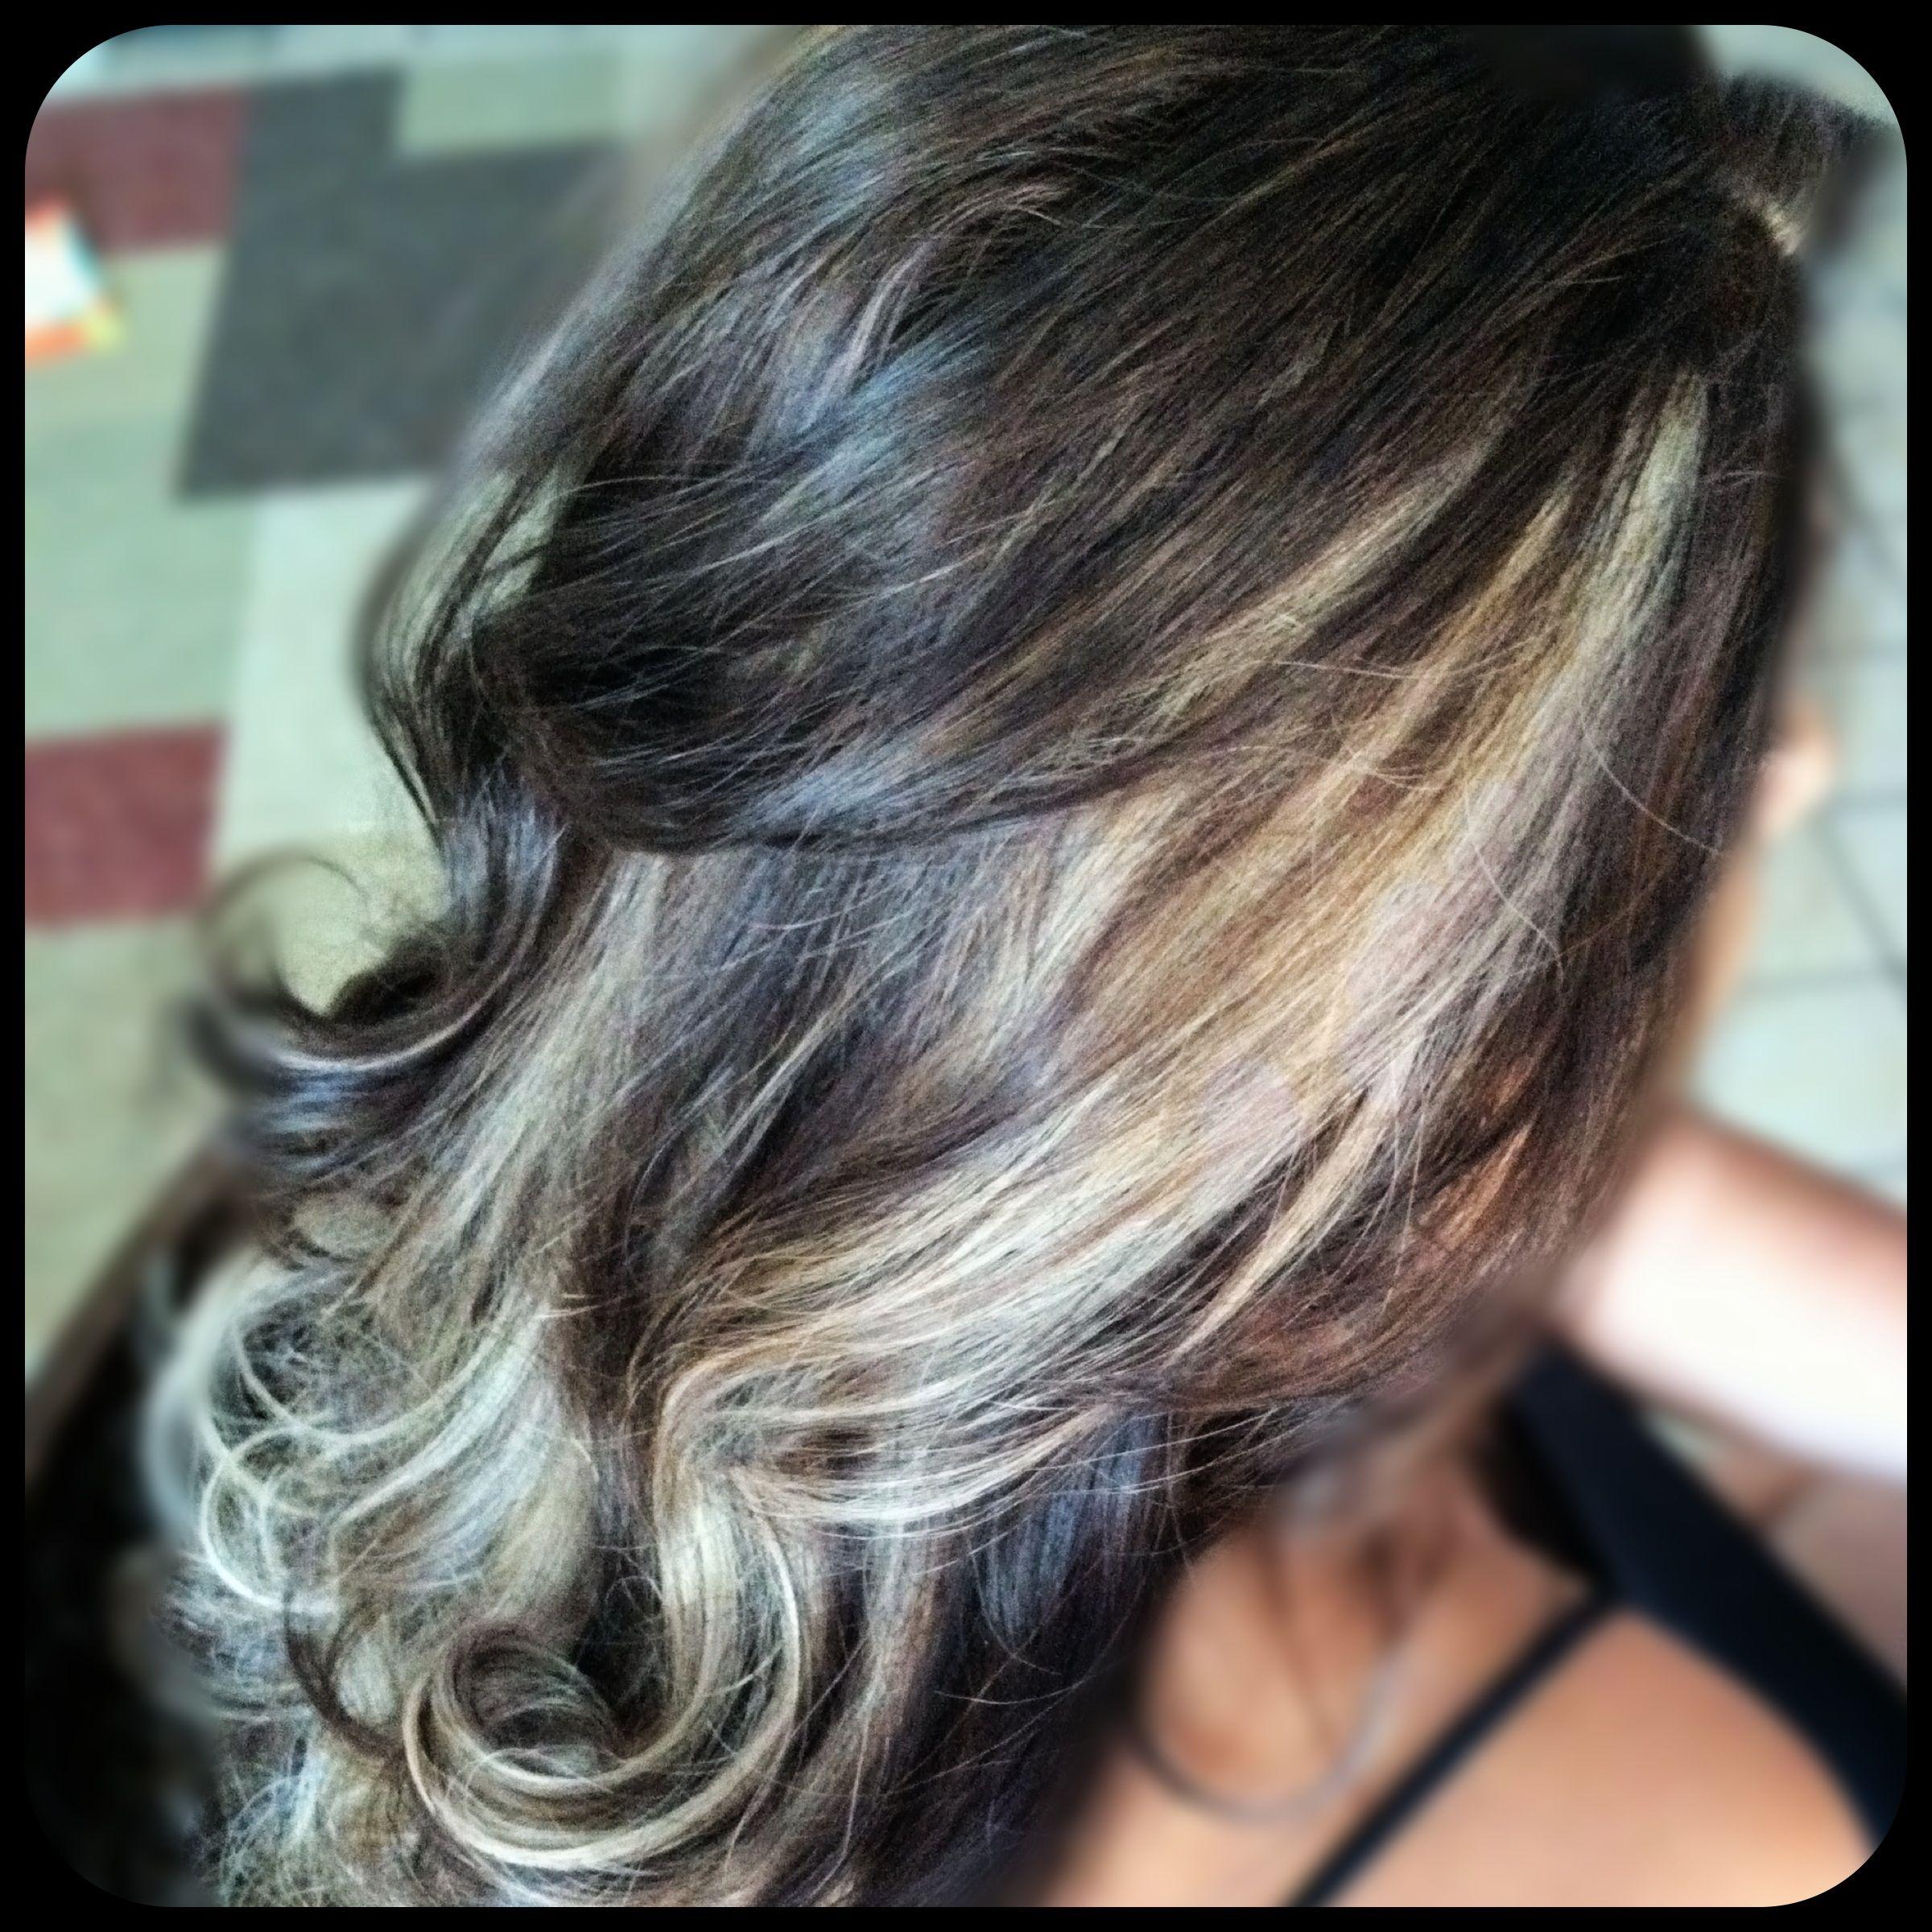 chocolate brown hair color with blonde peek a boo highlights | Hair ...